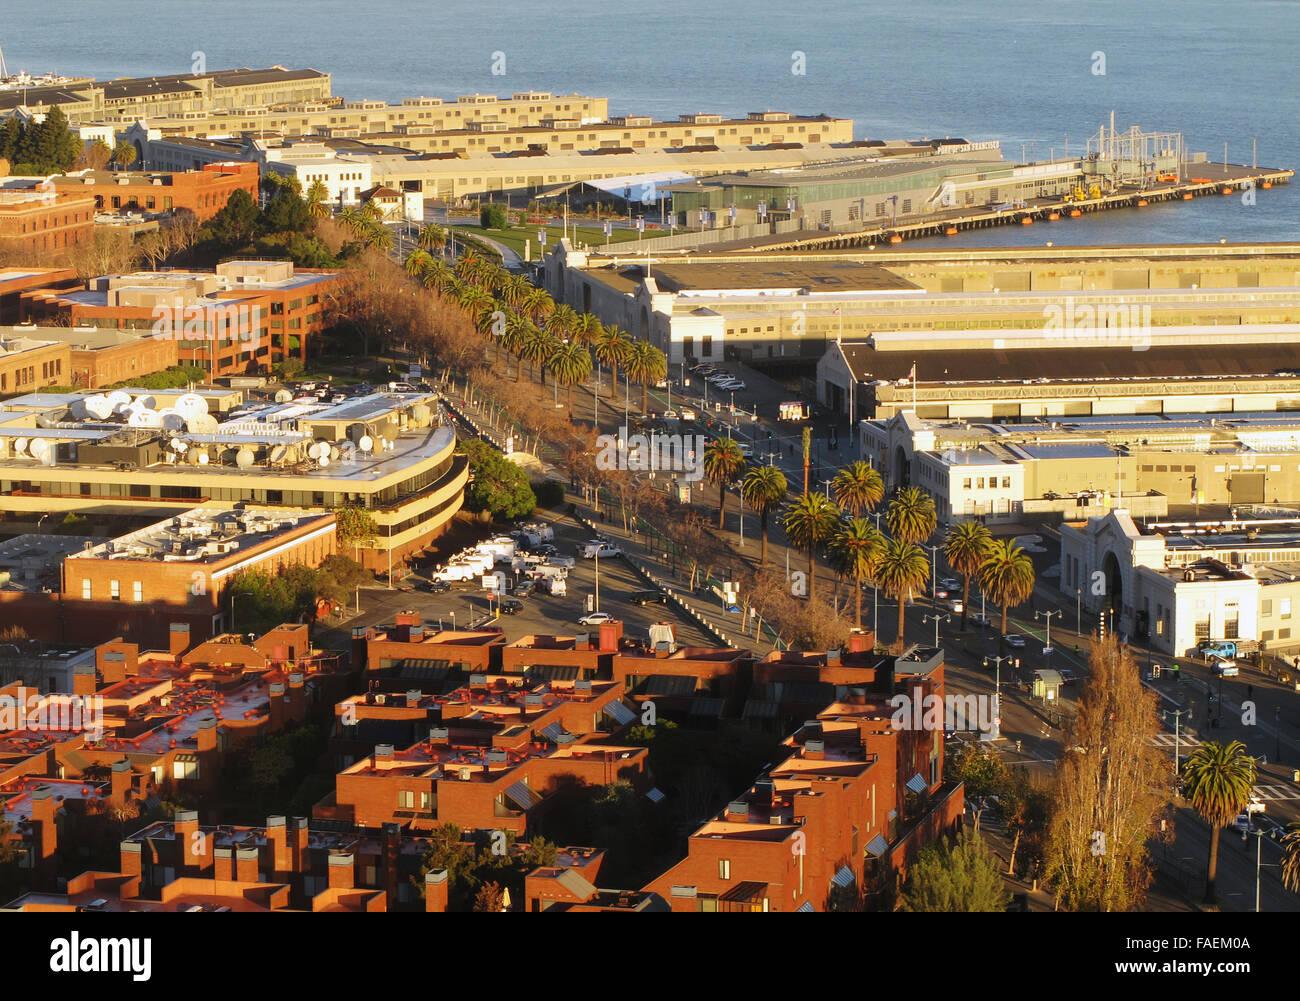 aerial photograph Embarcadero, Piers, North Beach, San Francisco, California - Stock Image